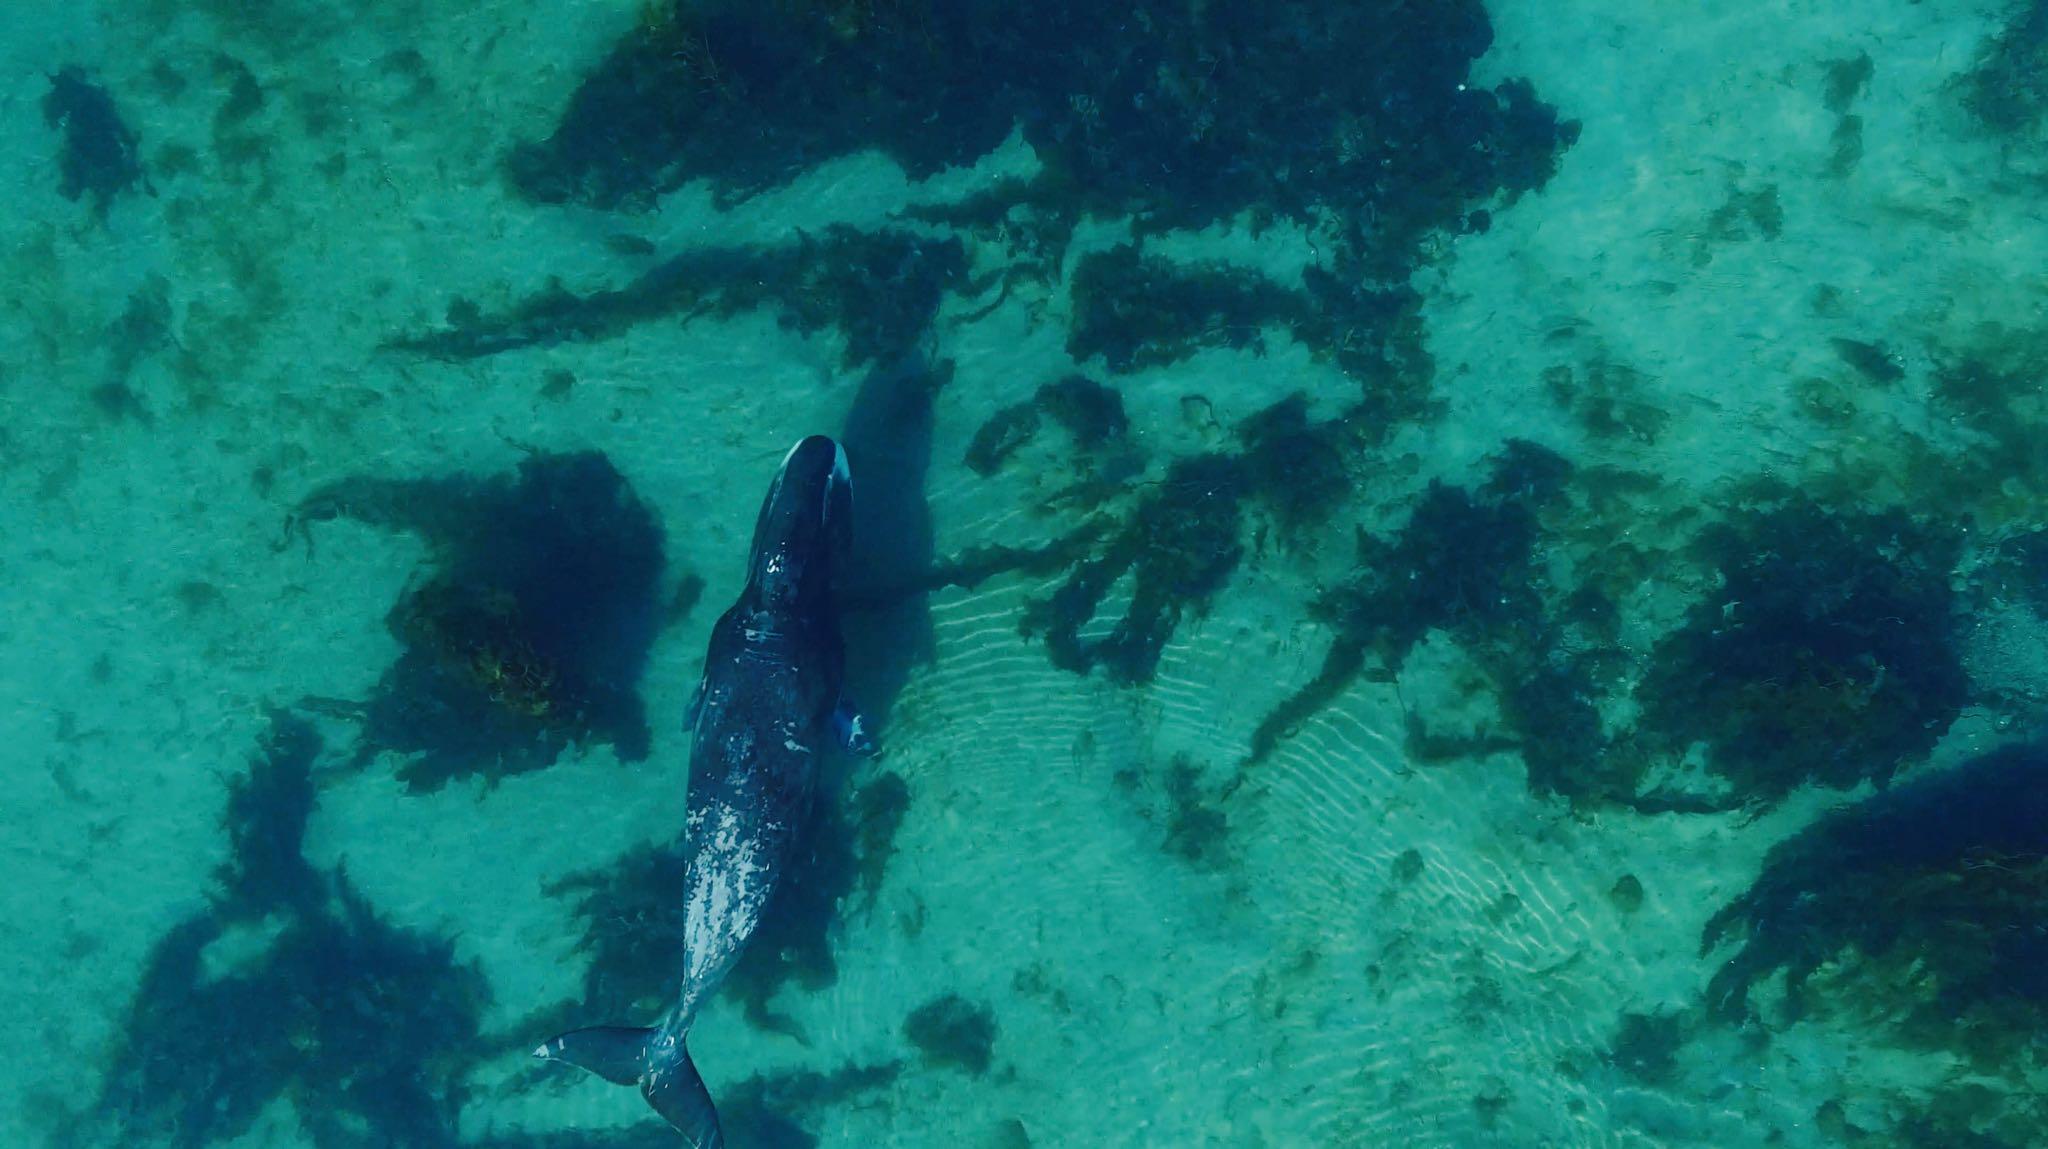 ballena-groenlandia-drone-video